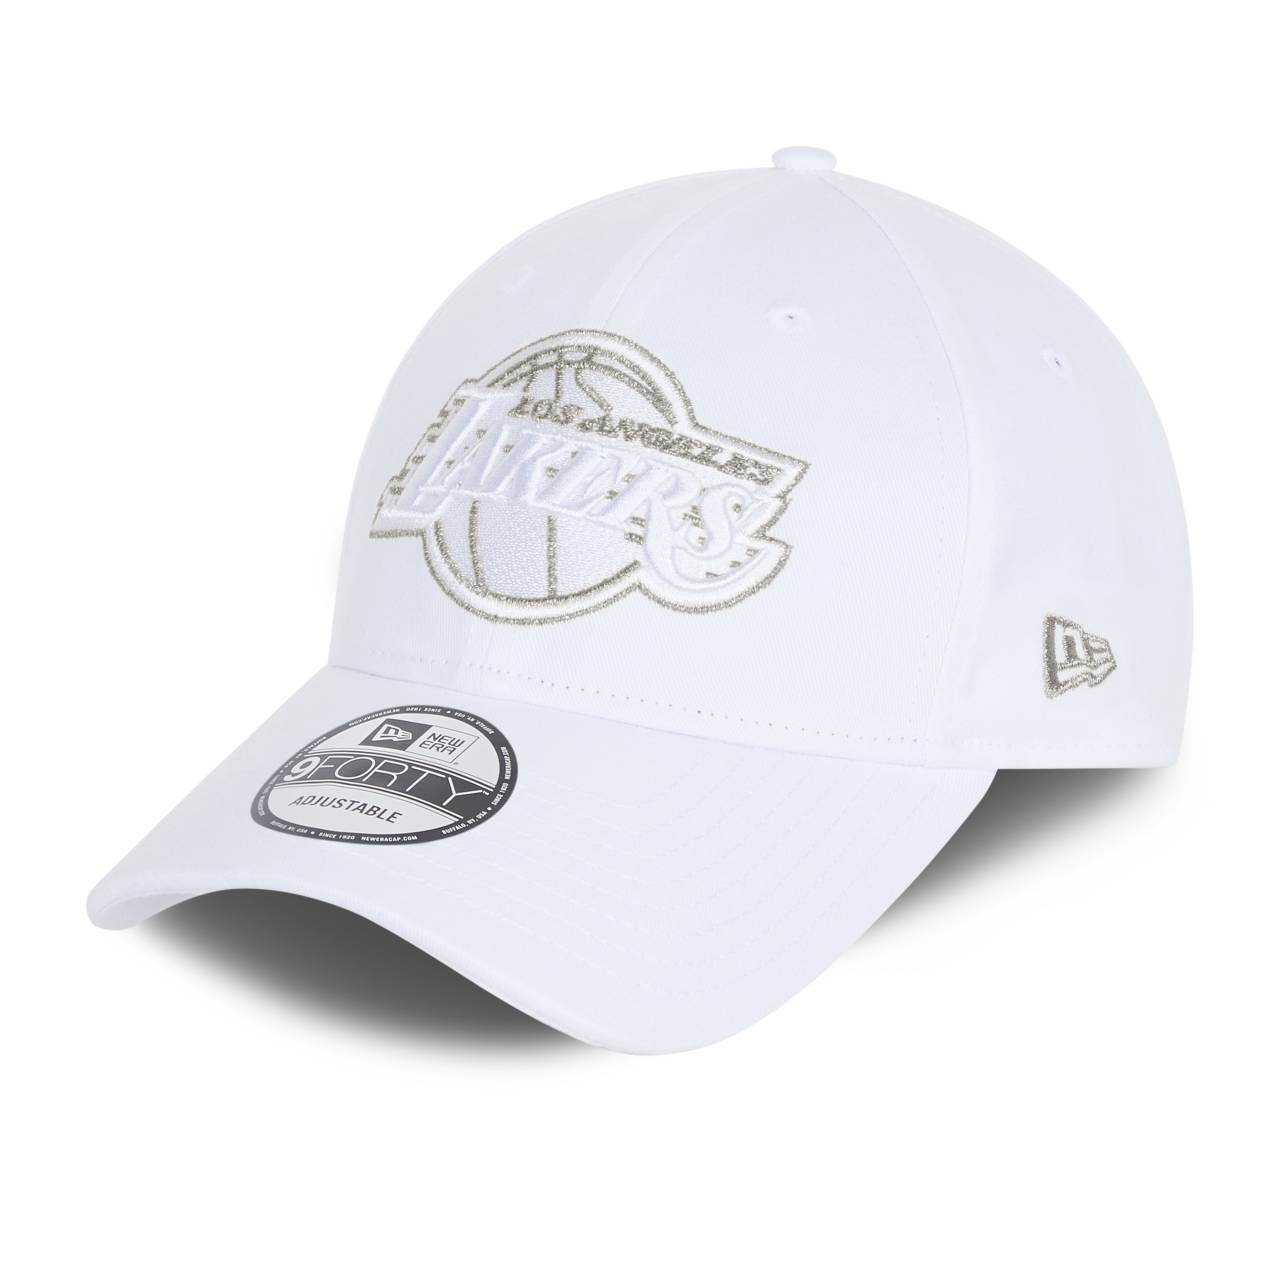 9FORTY NBA LOS ANGELES LAKERS METALLIC LOGO WHITE CAP